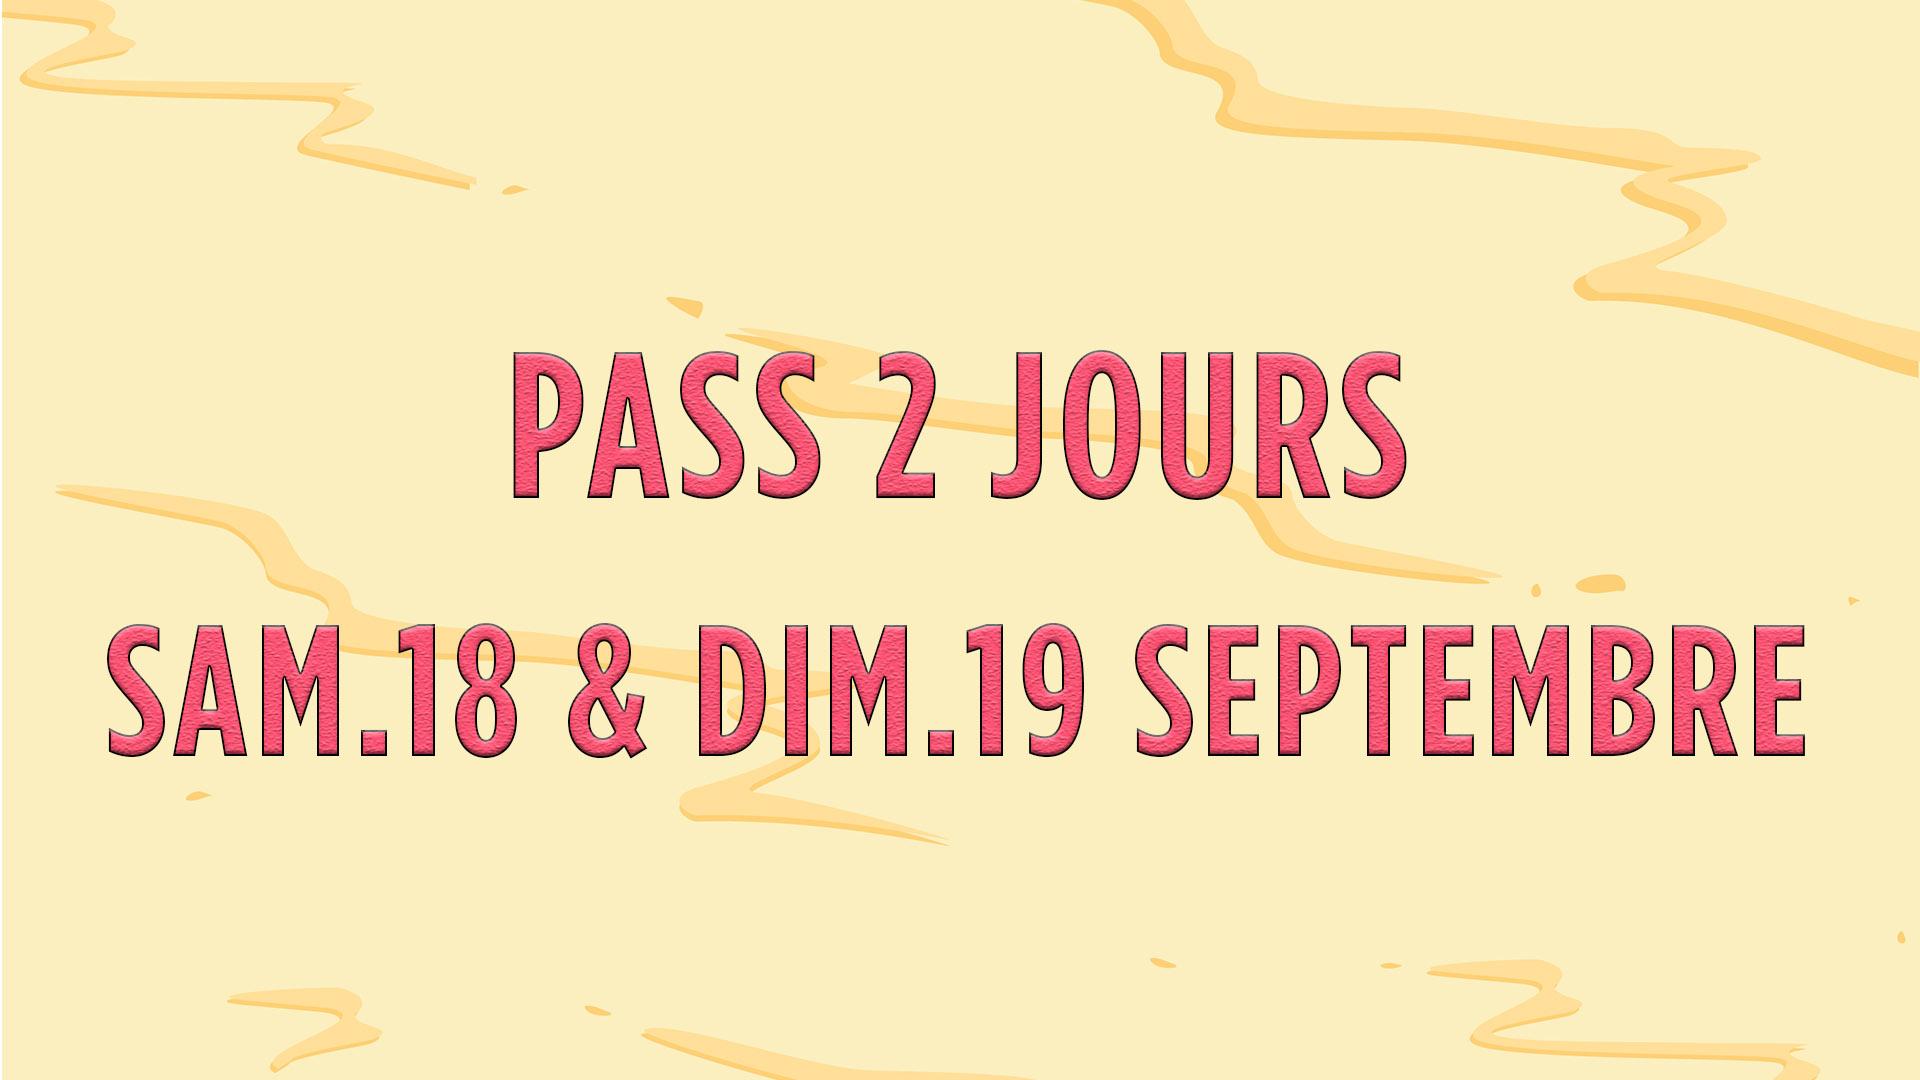 PASS 2 JOURS - SAMEDI 18 & DIMANCHE 19 SEPTEMBRE 2021